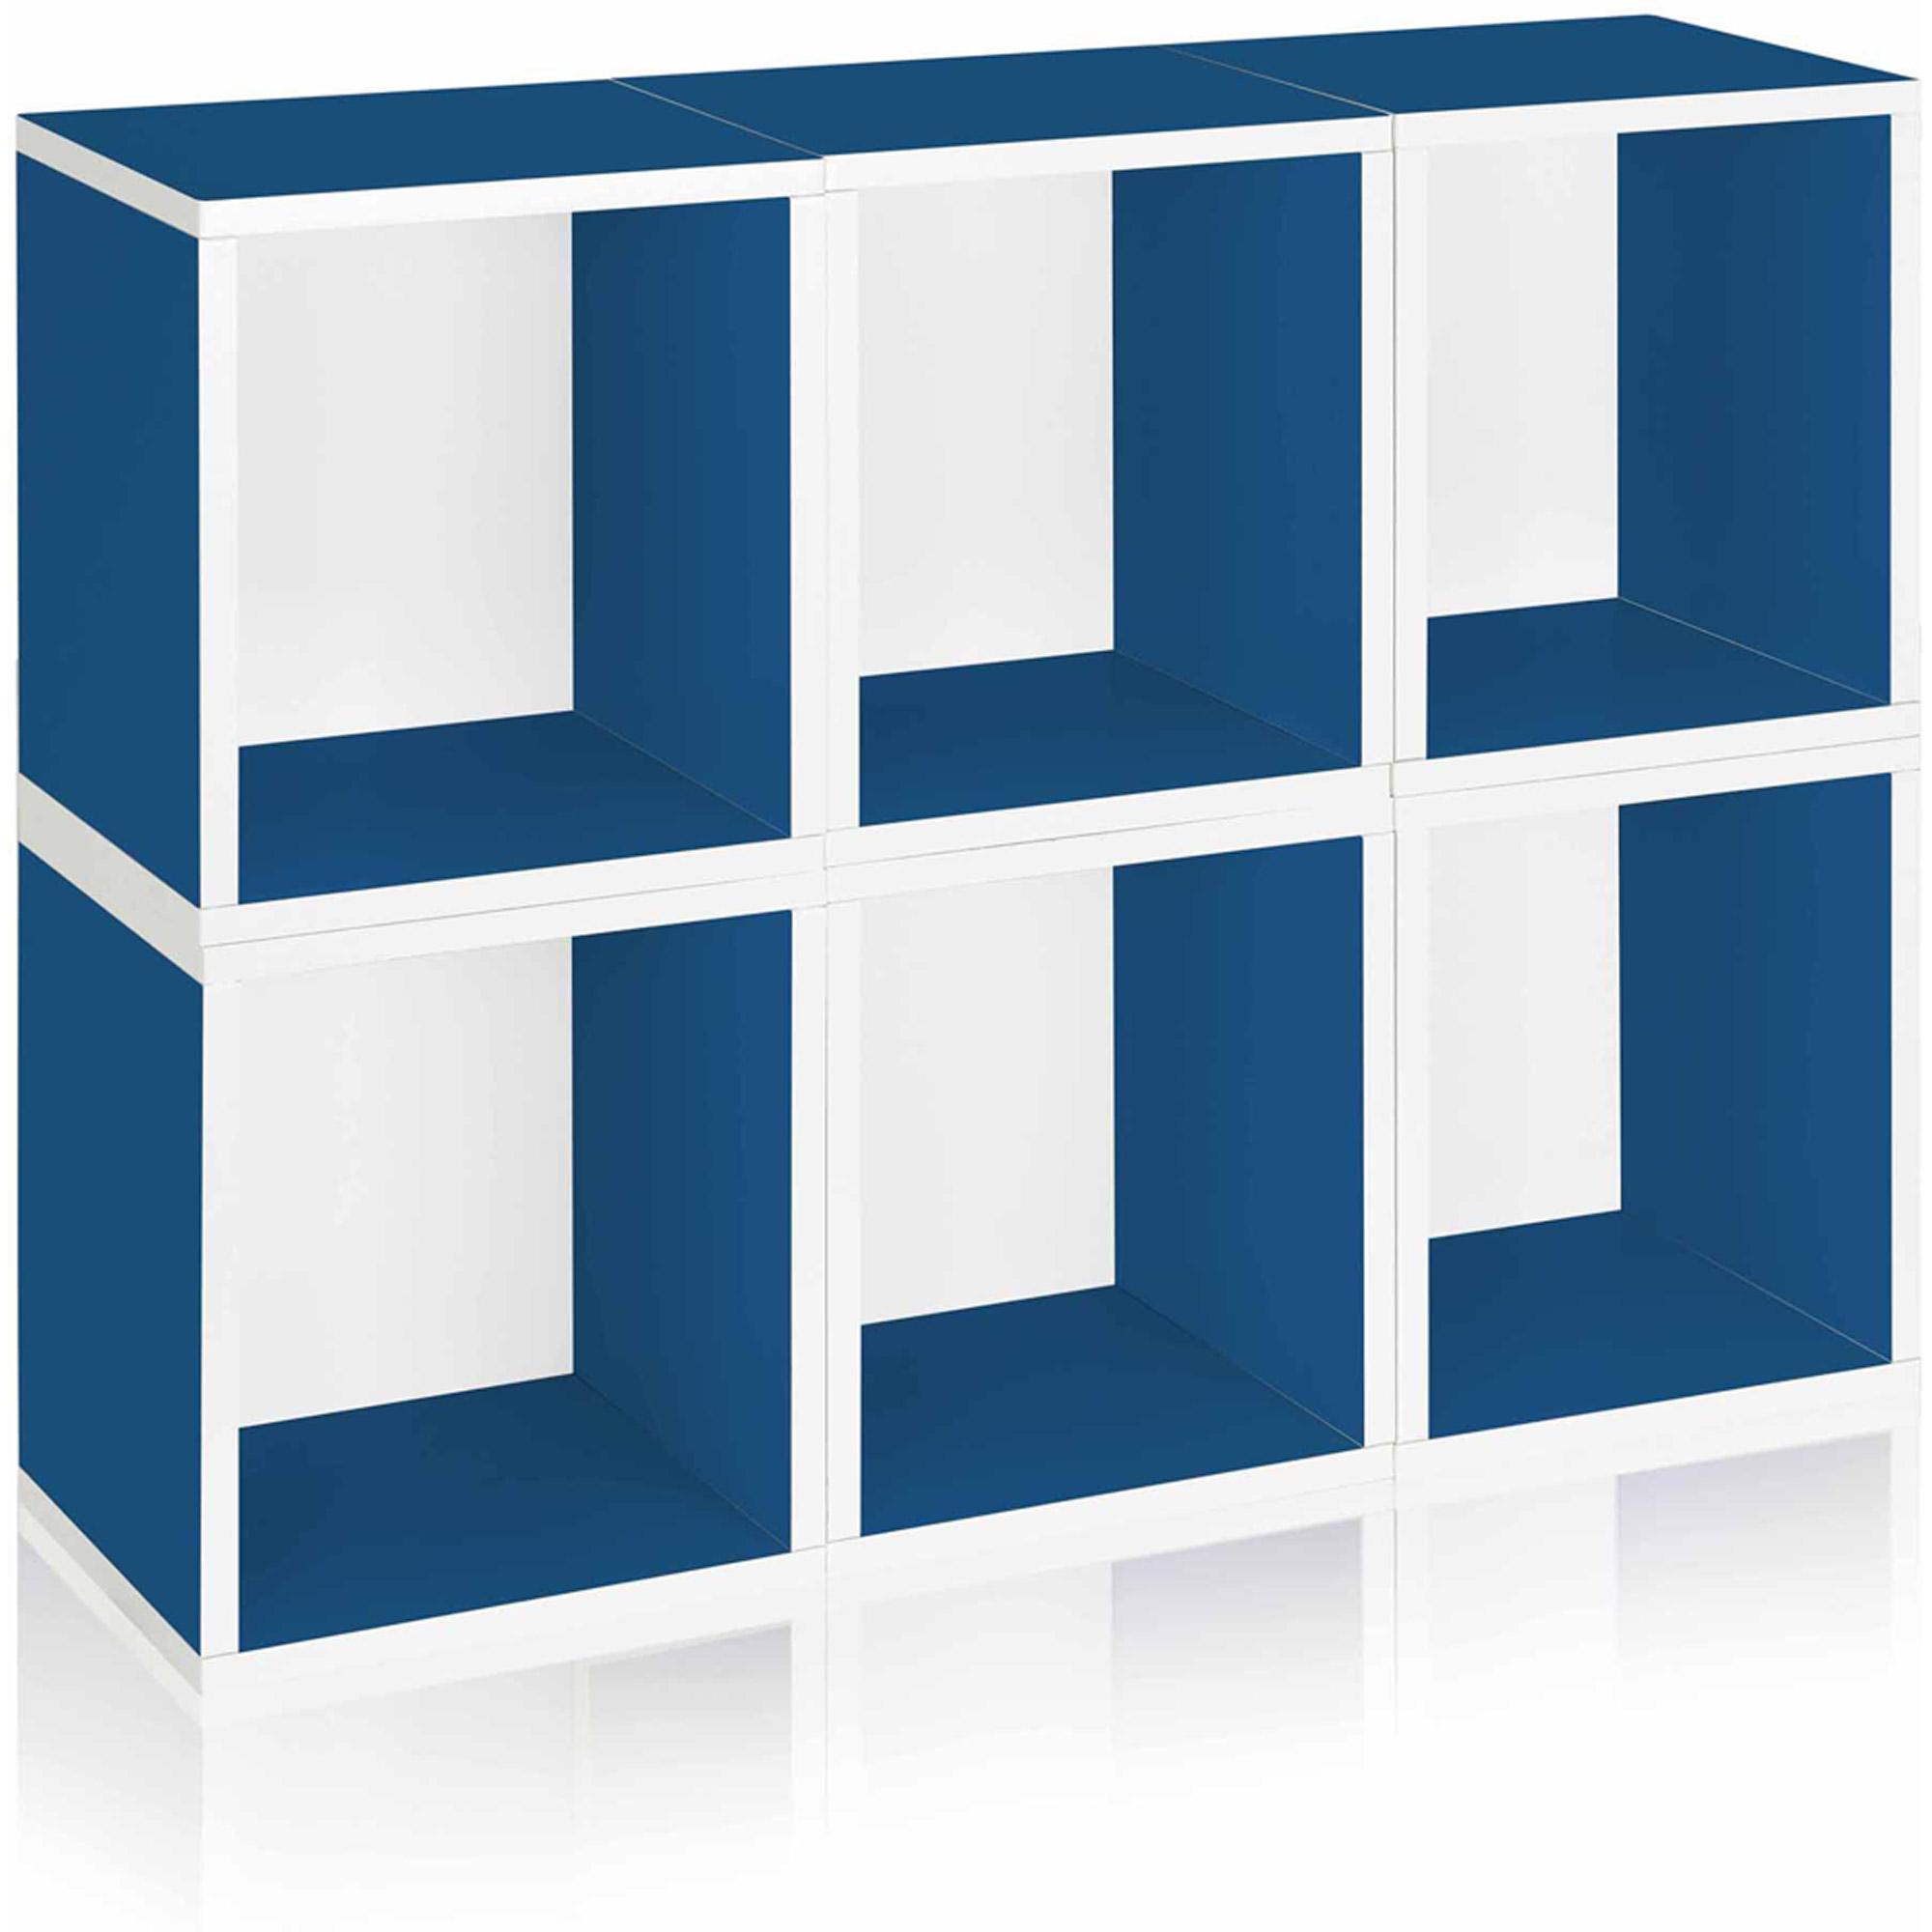 Way Basics Eco Stackable Modular Storage Cubes Plus, Blue, 6-Pack